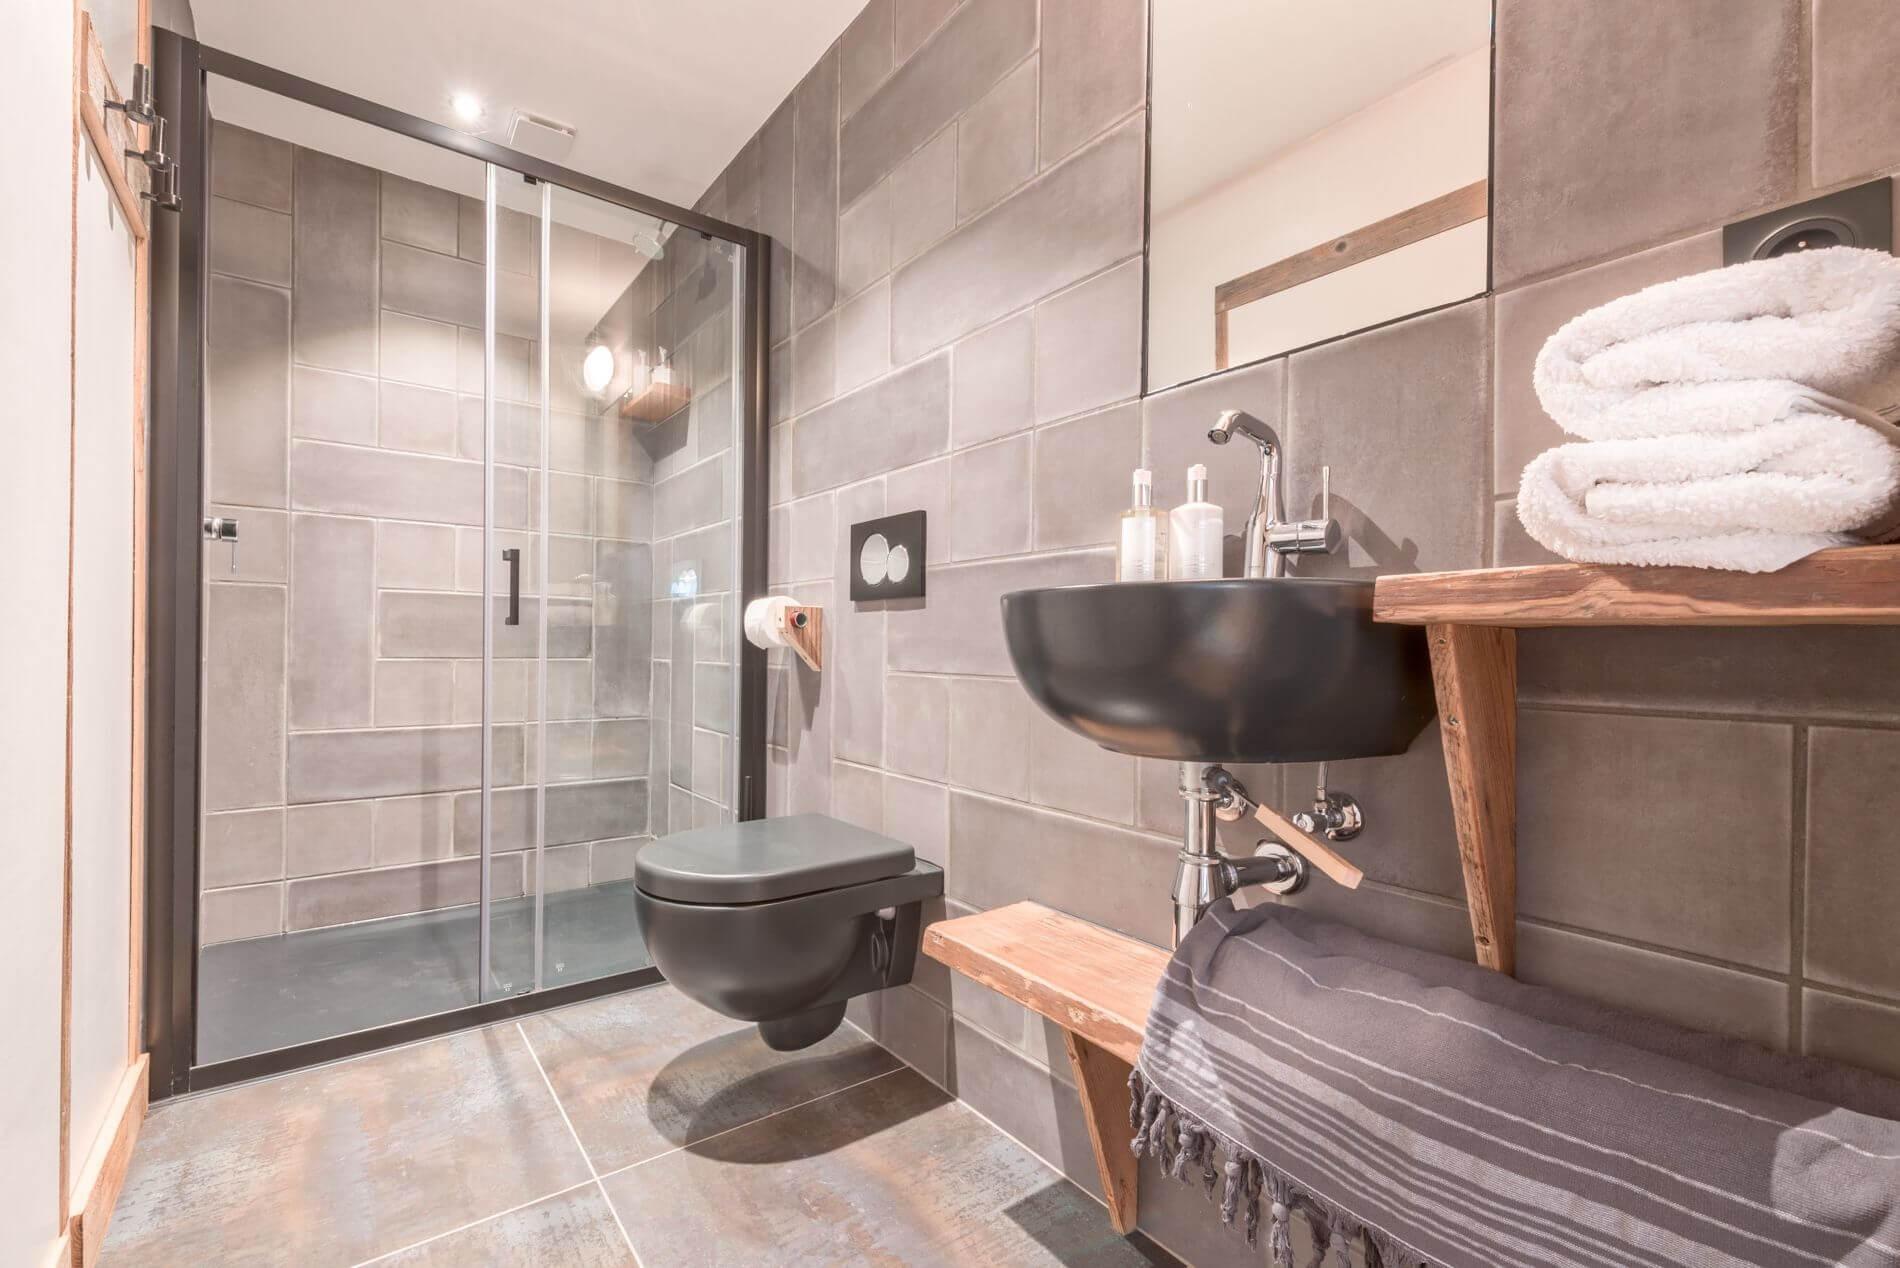 Morzine Location Appartement Luxe Morzilute Salle De Douche